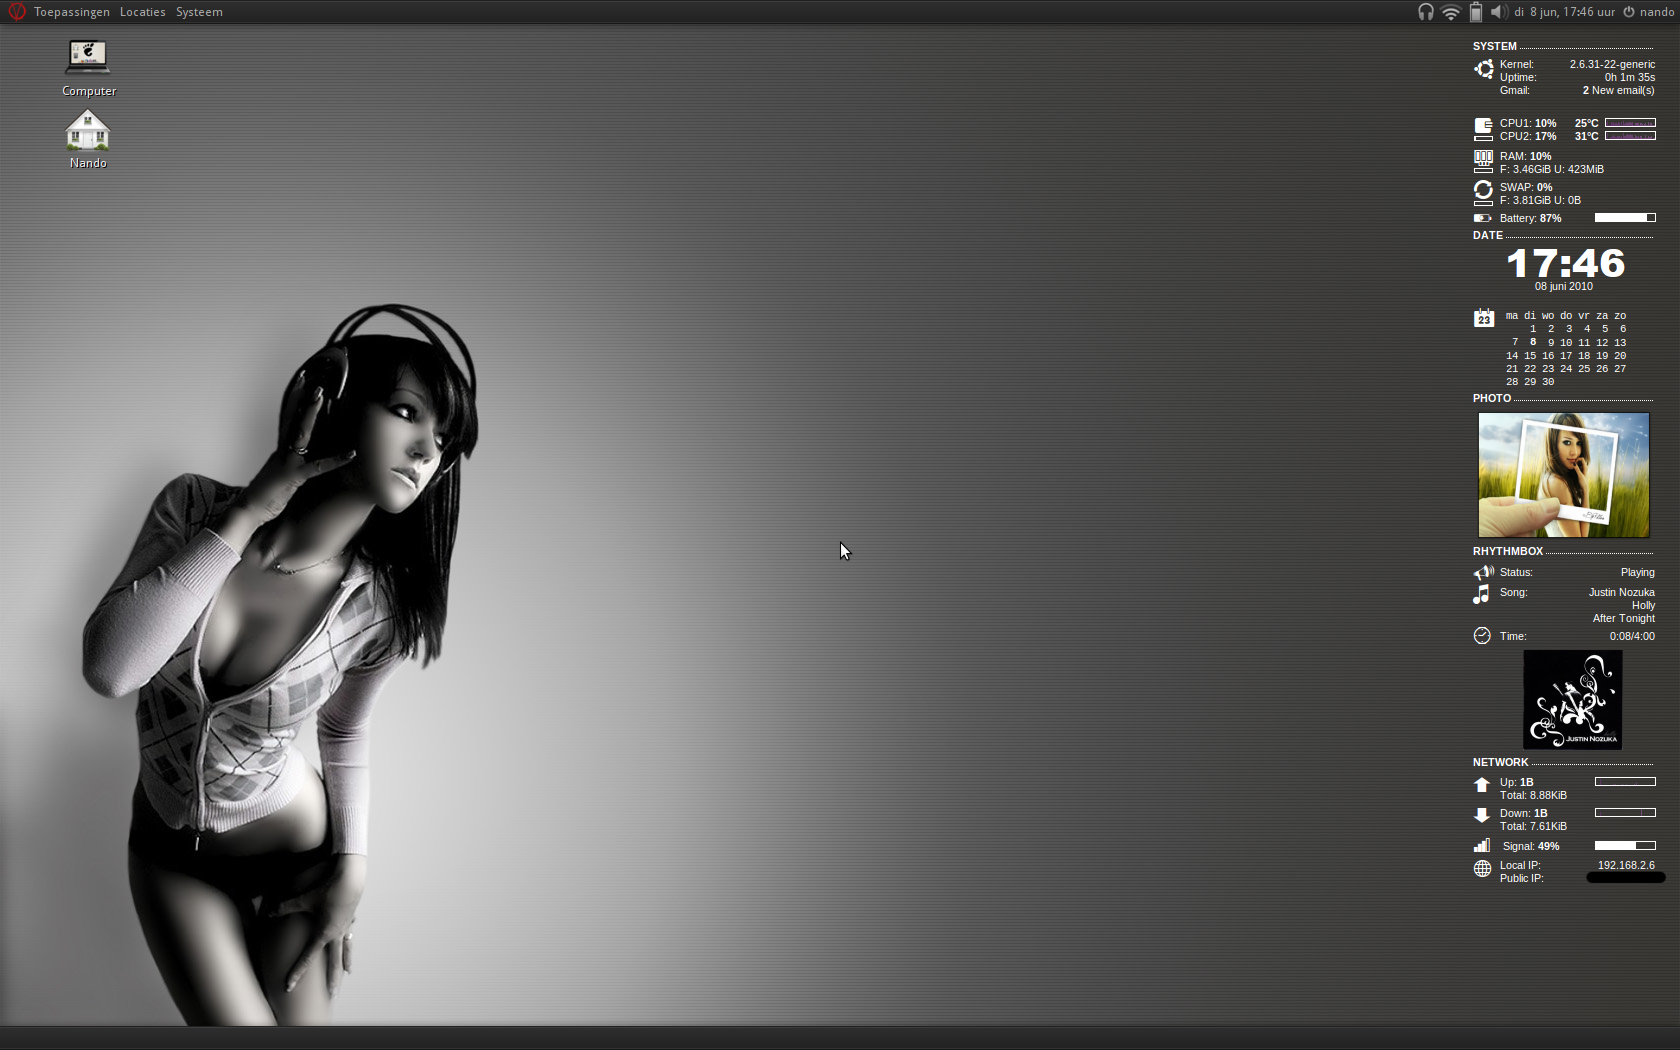 http://fc04.deviantart.net/fs71/f/2010/159/5/a/Ubuntu_9_10___Conky_by_cookiebisquit.png